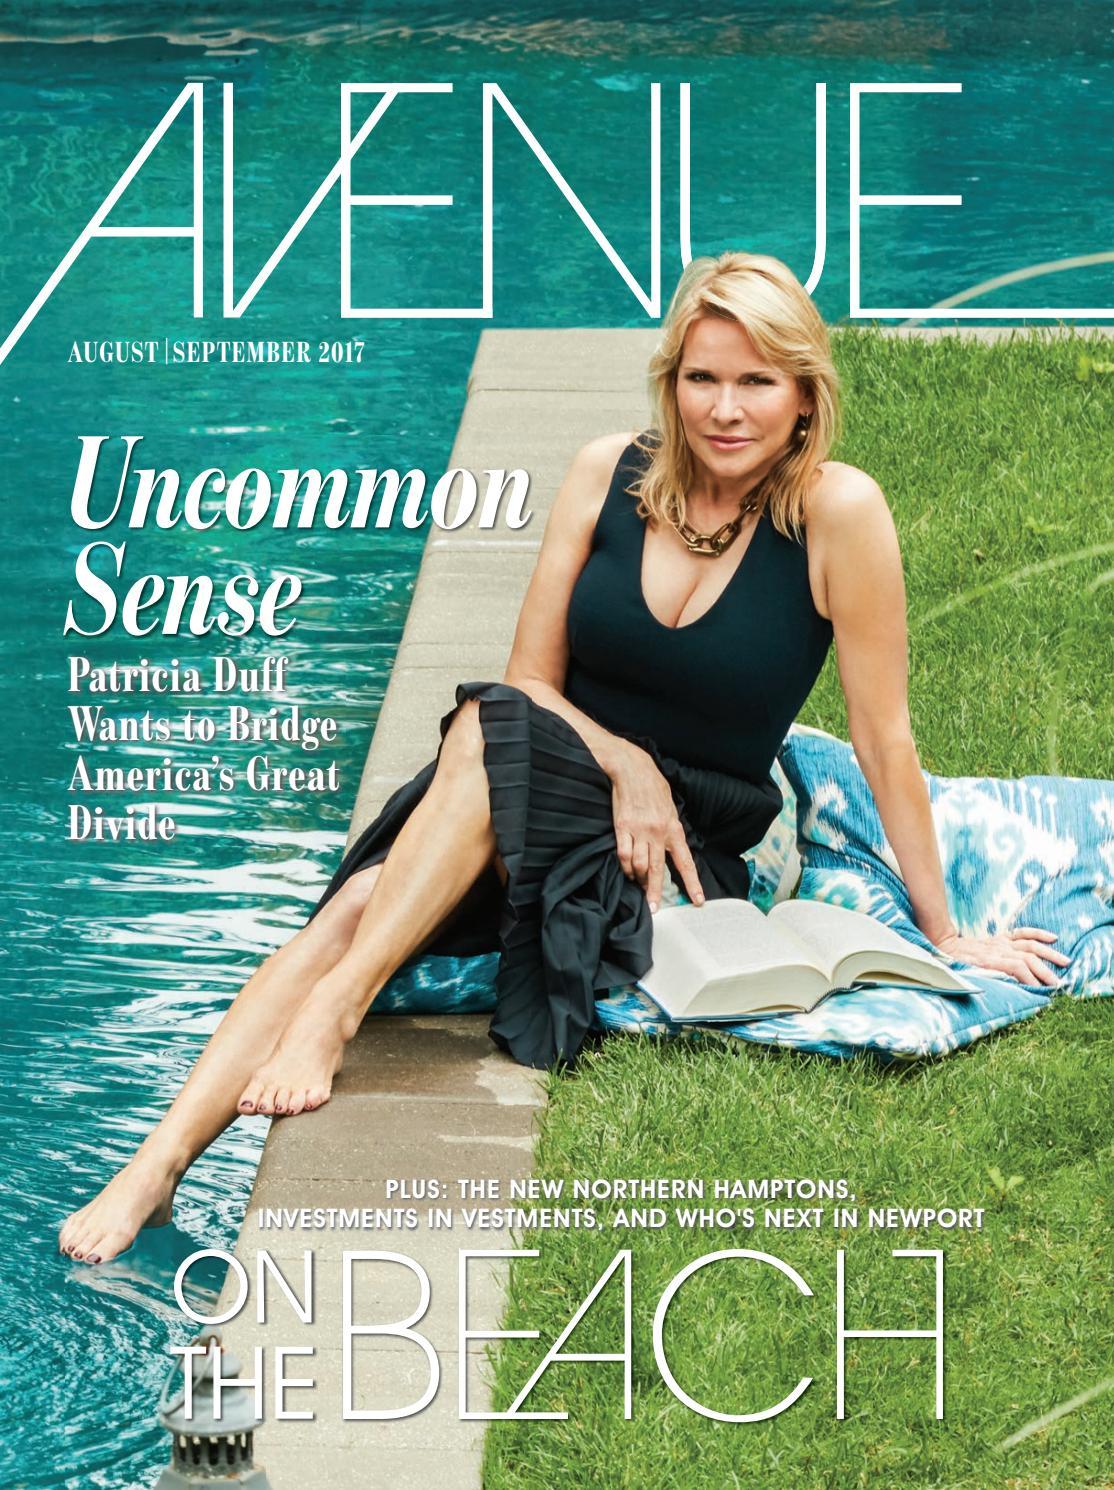 Avenue On The Beach Augustseptember 2017 By Avenue Magazine Issuu